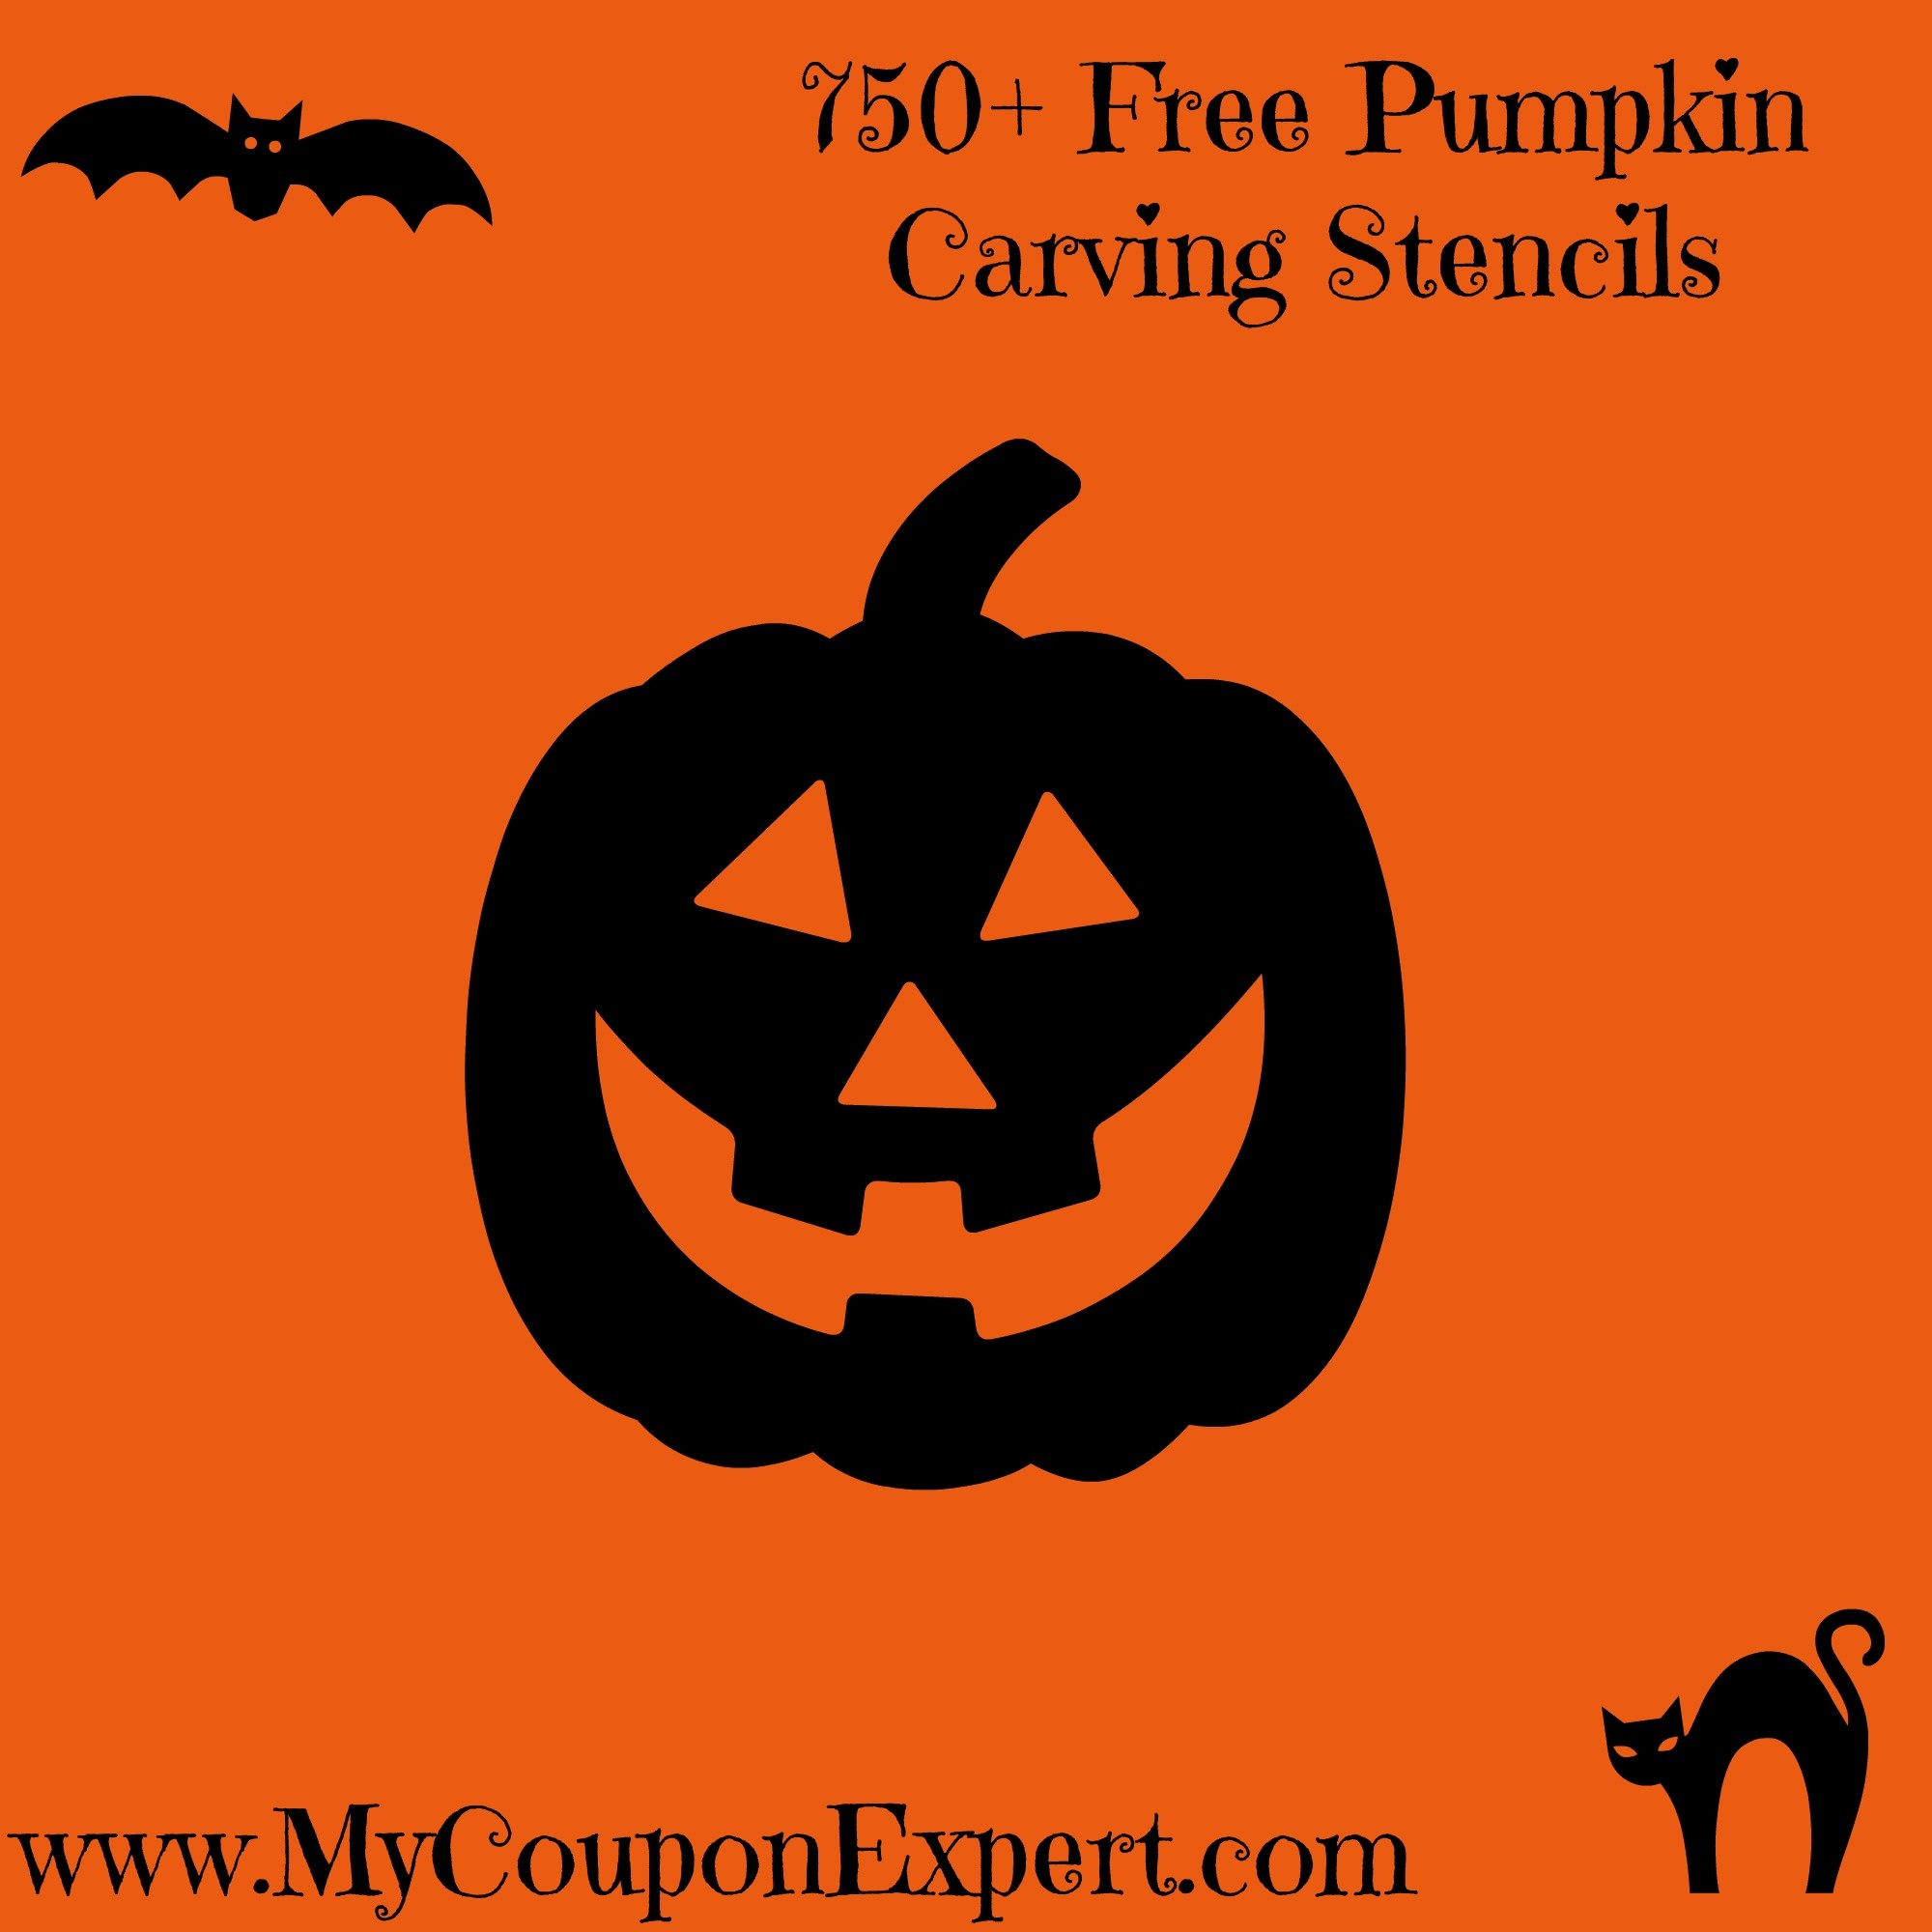 750+ Free Pumpkin Carving Stencils · - Halloween Pumpkin Carving Stencils Free Printable